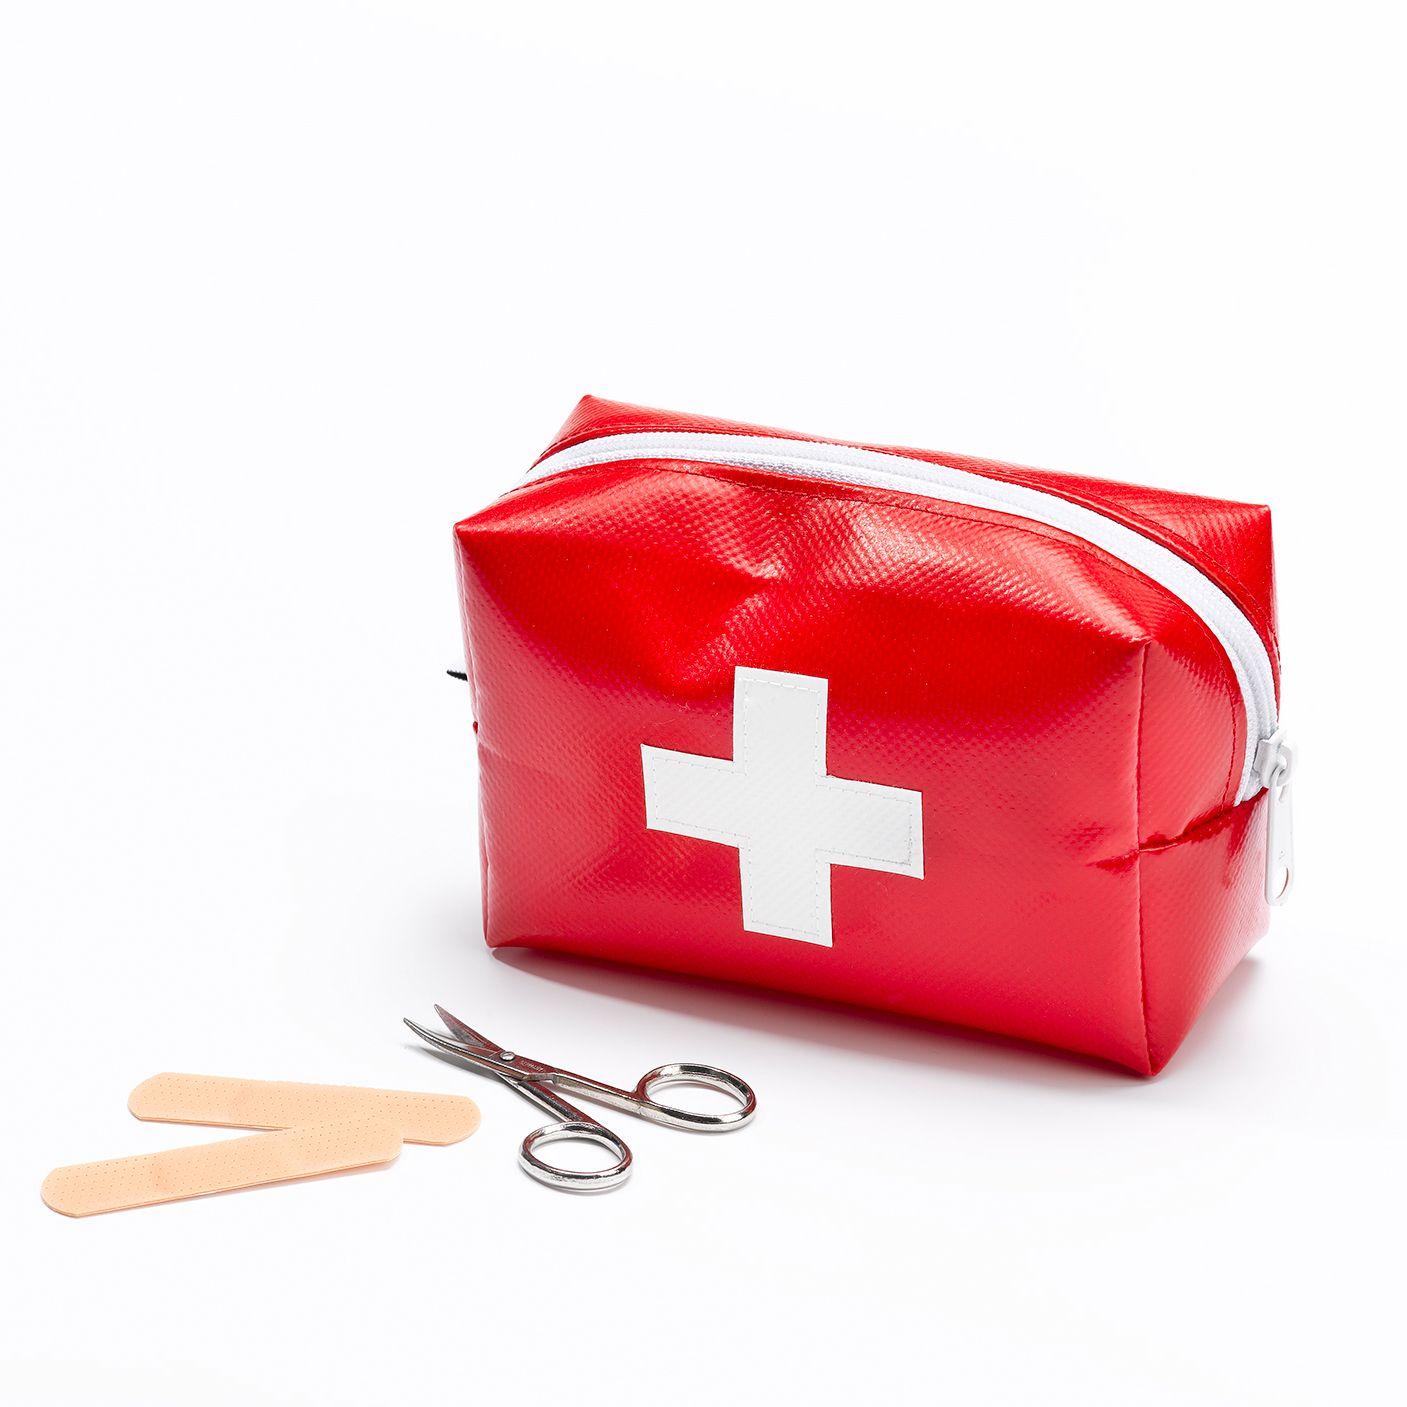 Notfalltasche Notfalltasche Taschen Und Notfall